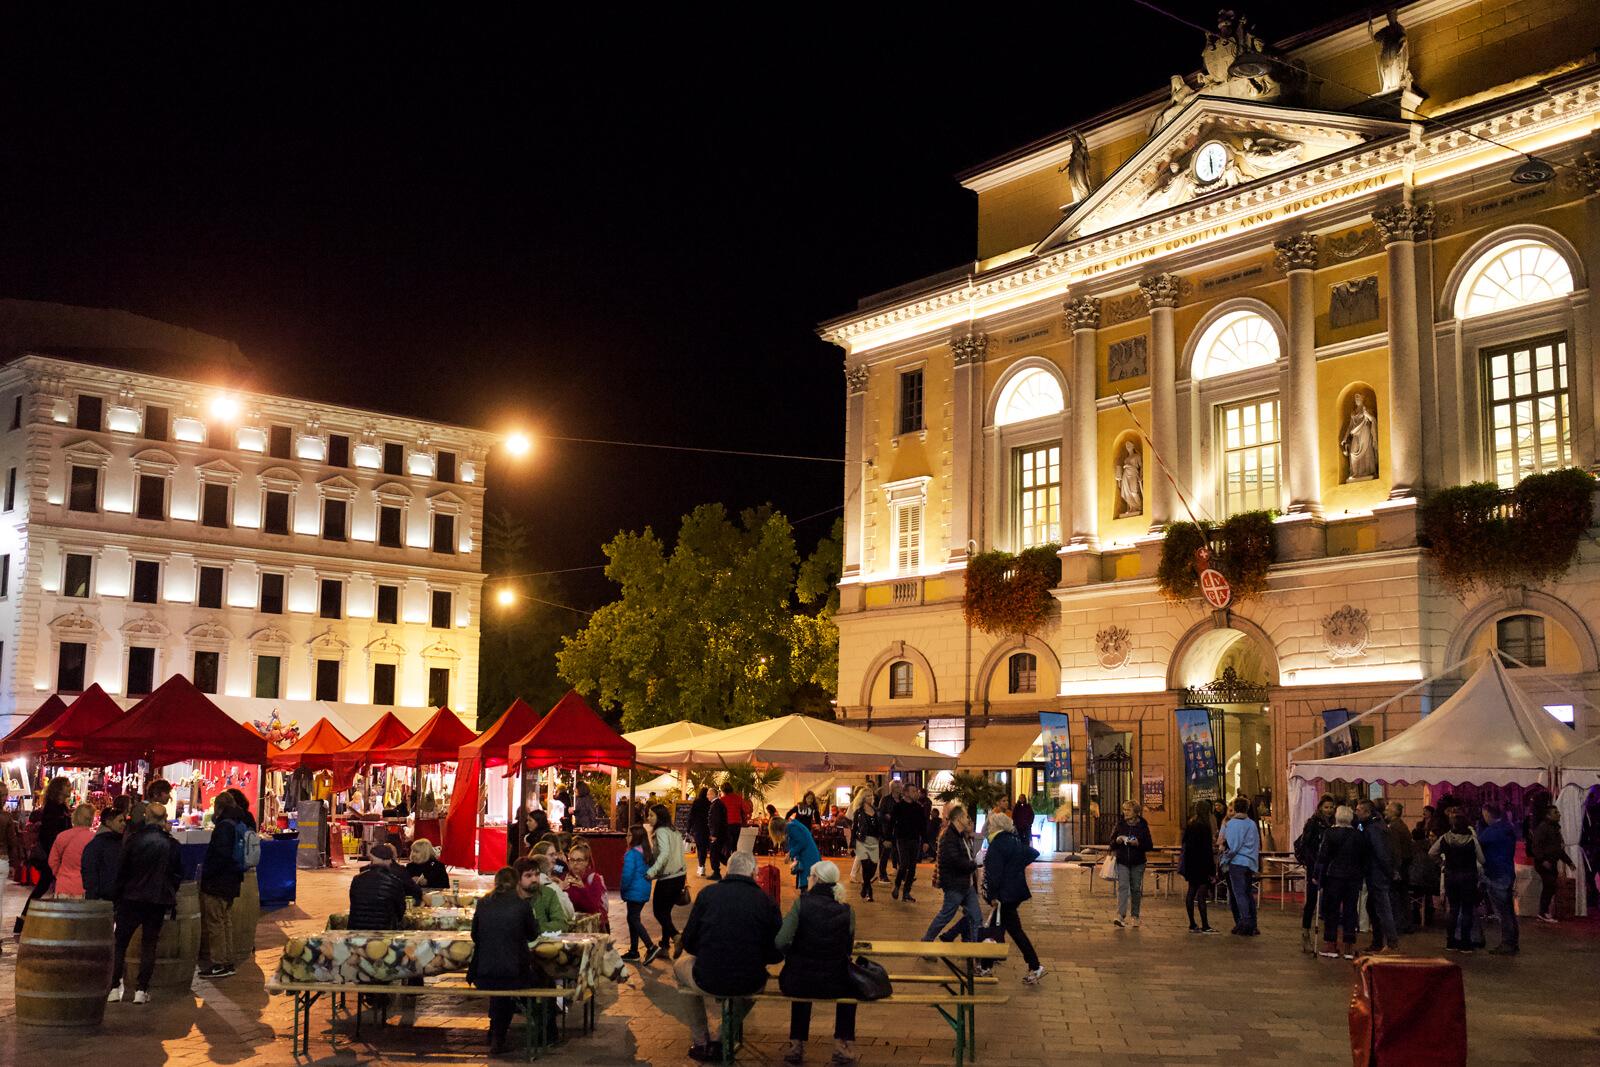 Festival d'automne de Lugano 2019